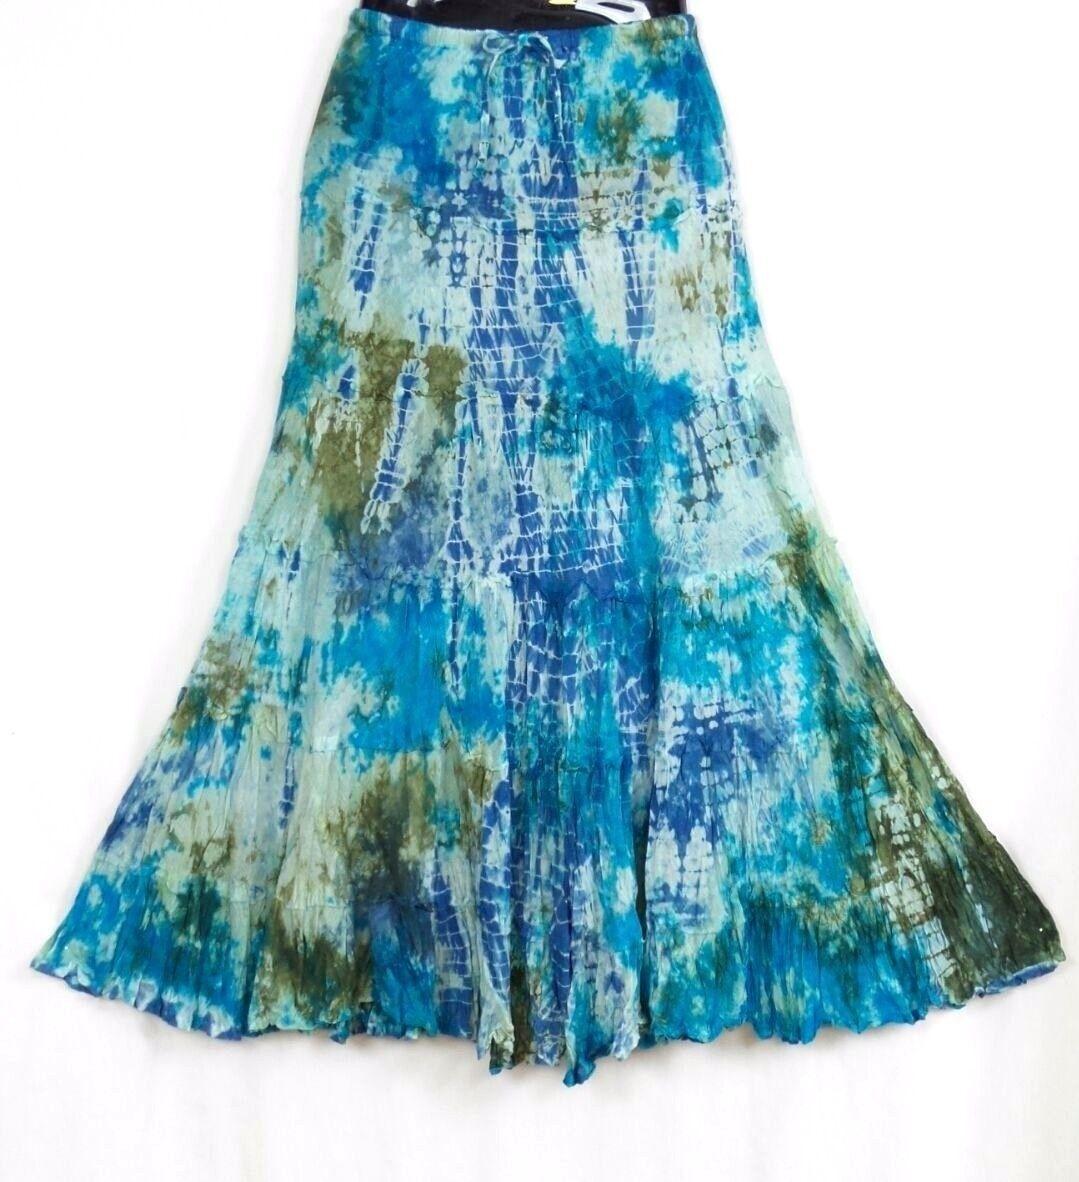 Tie Dye Skirt Long bluee Hippie Casual Peasant Summer Festival 100% cotton NWT